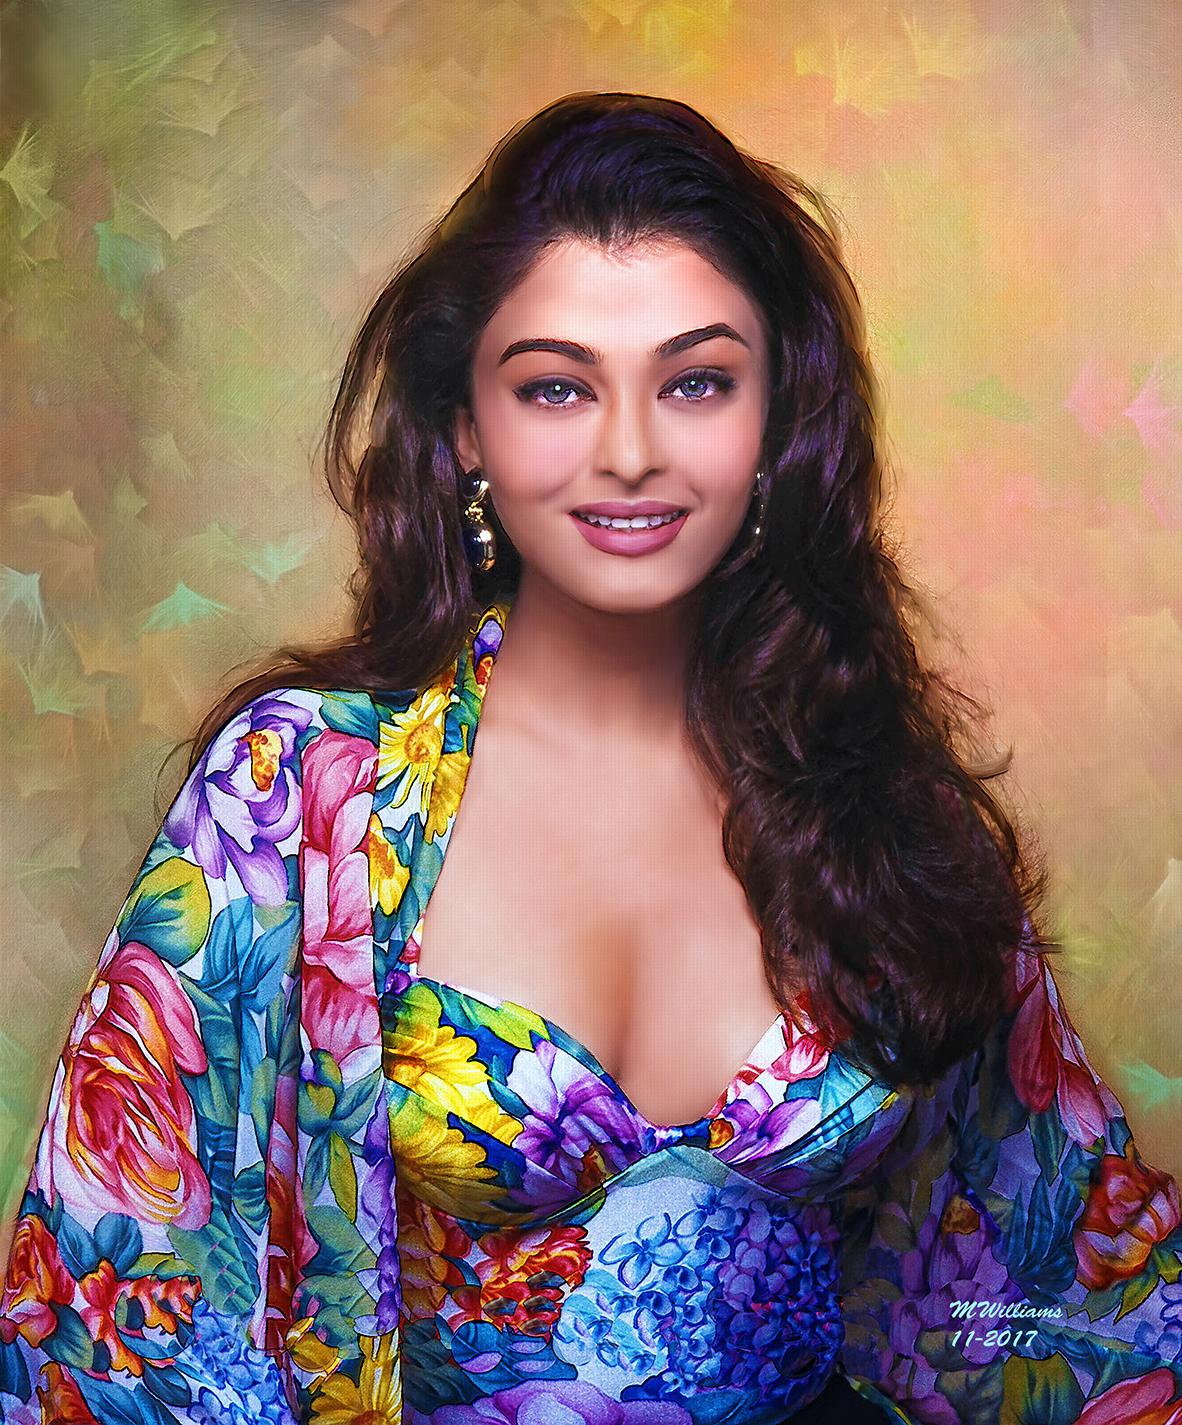 aishwarya rai bachchan - photo #49